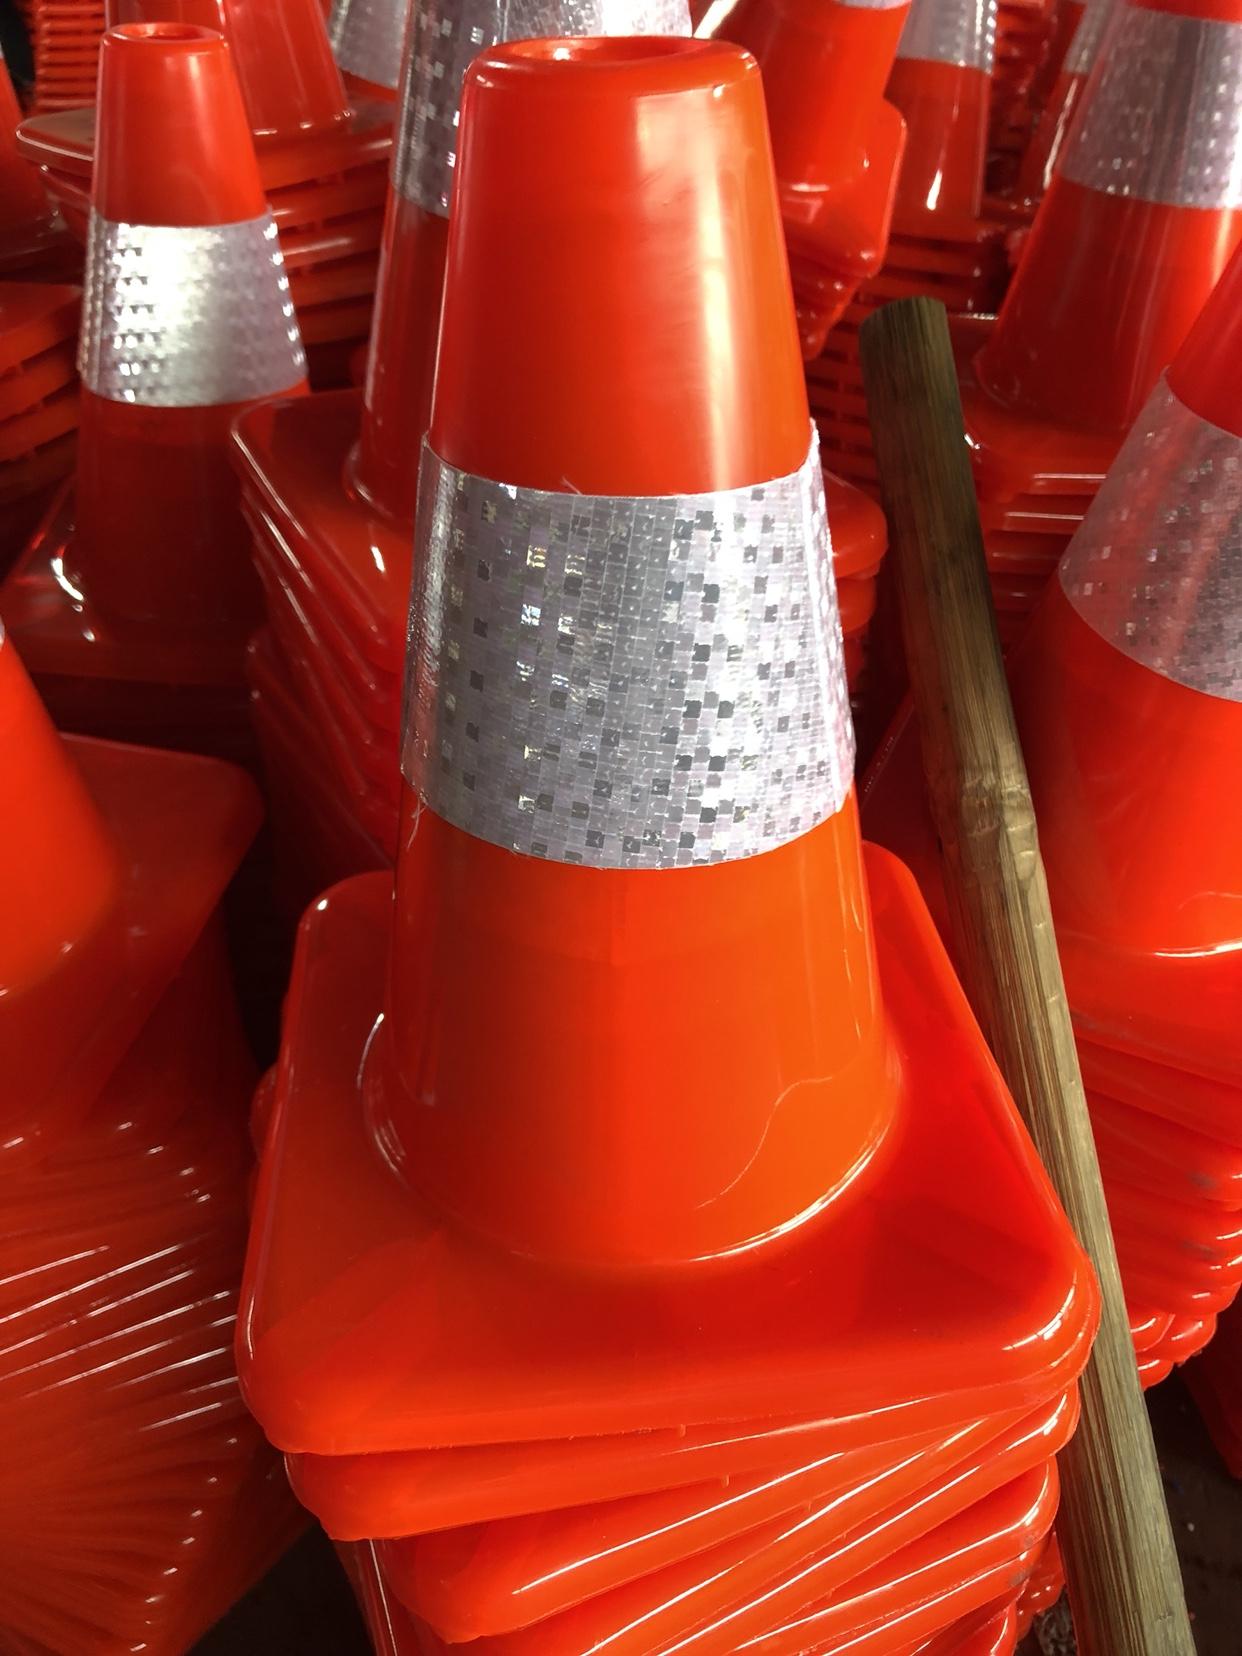 70cm rubber road cone PVC road cone plastic square cone do not parking  parking ice cream bucket barrier roadblocks